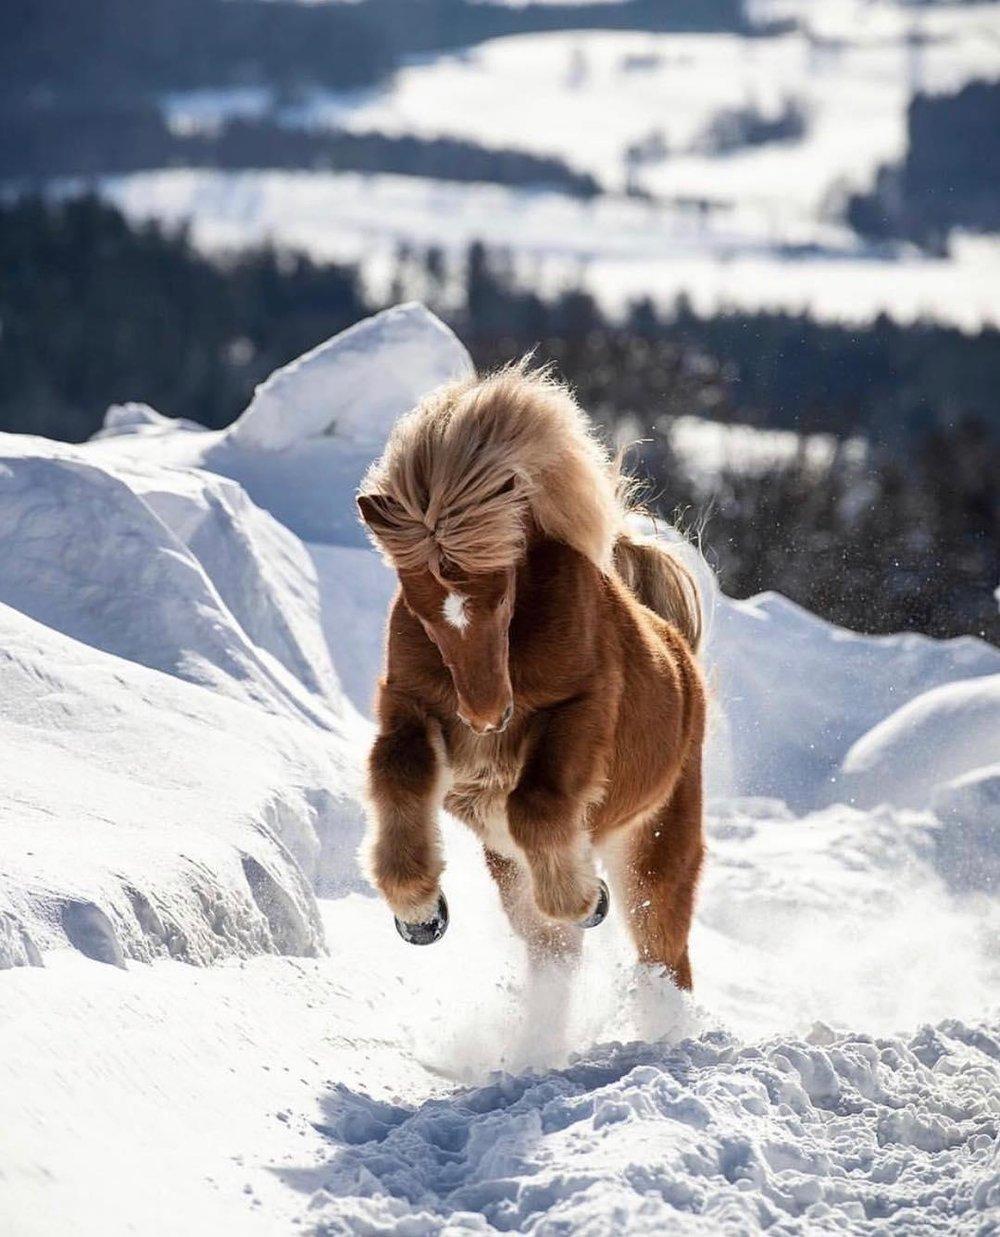 horse_wildlife_photography_24.jpg